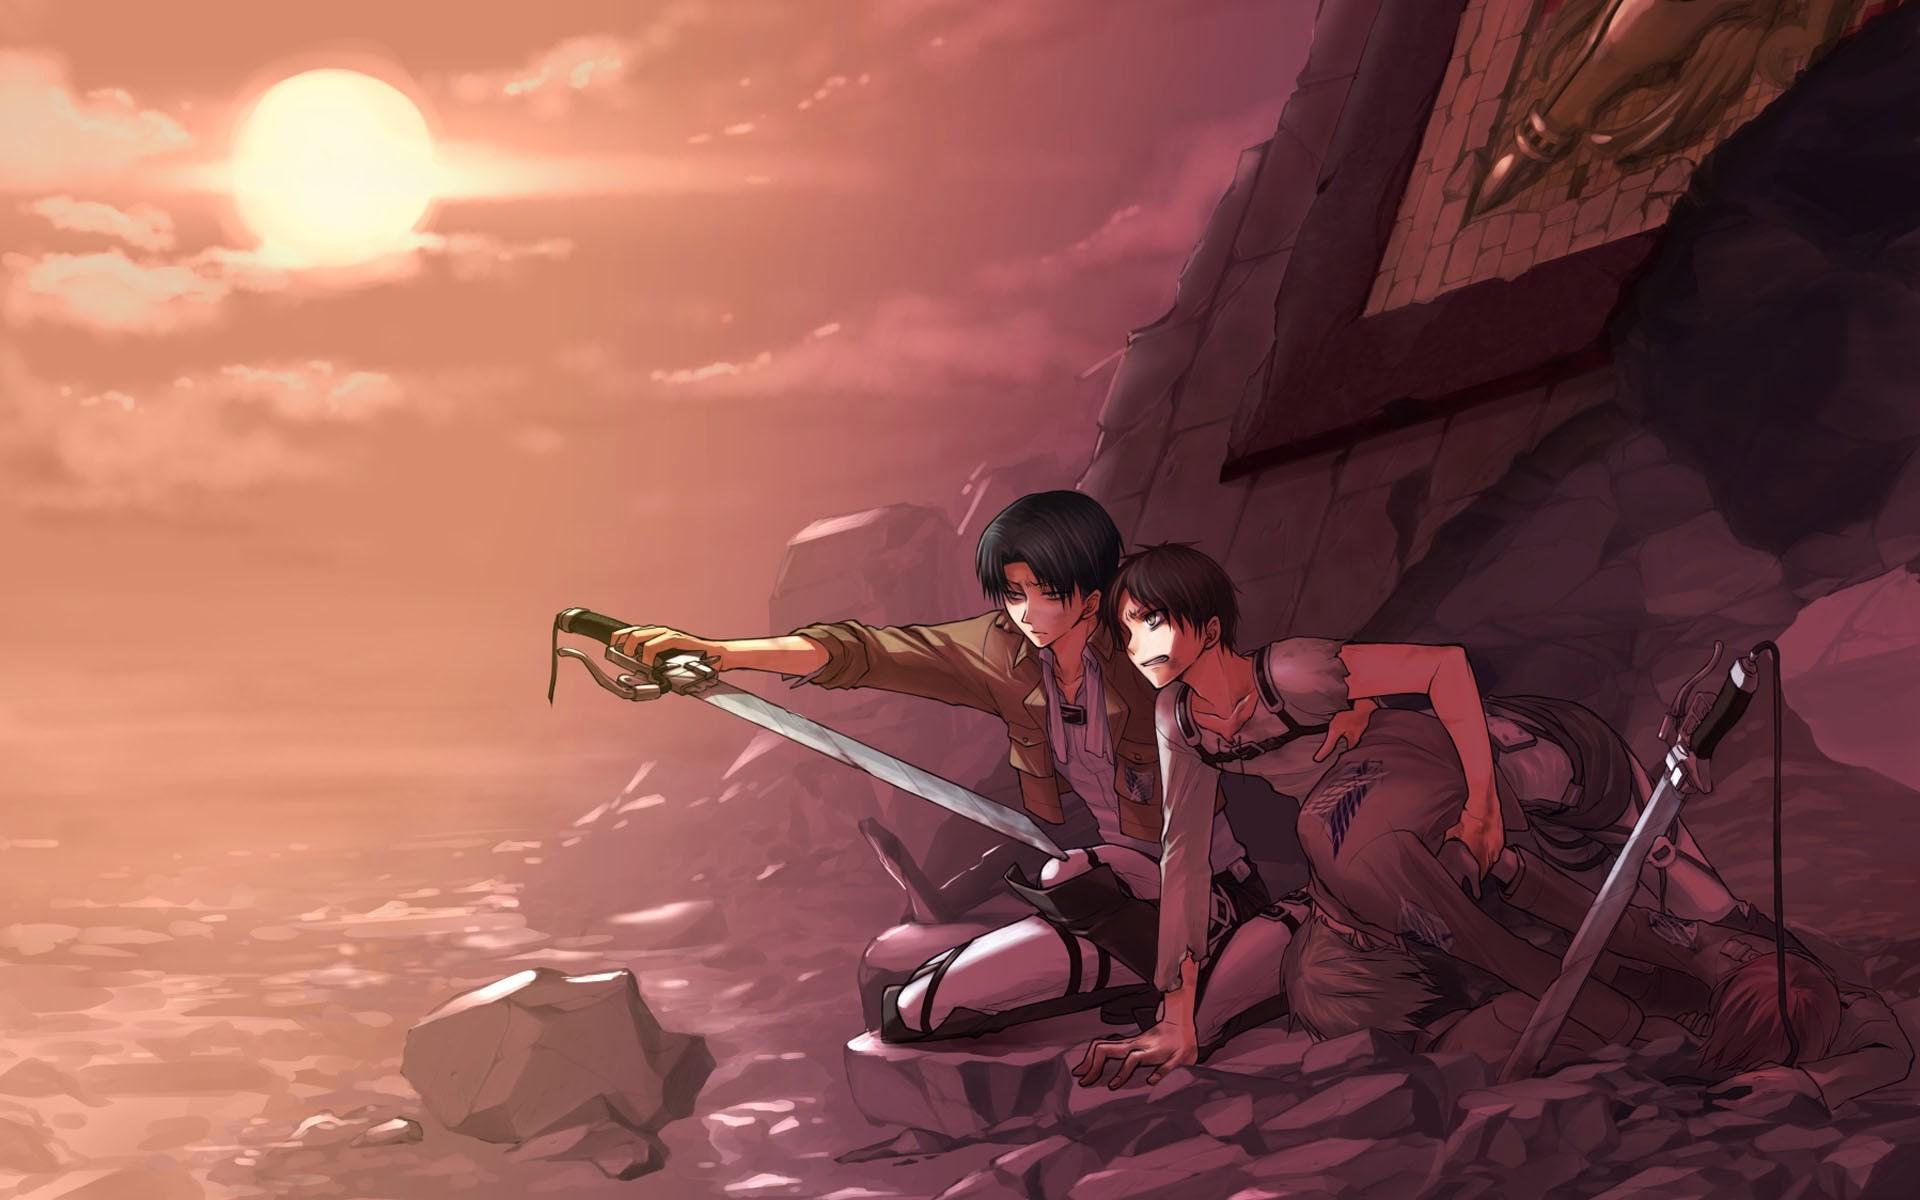 levi eren armin attack on titan shingeki no kyojin sunset hd wallpaper